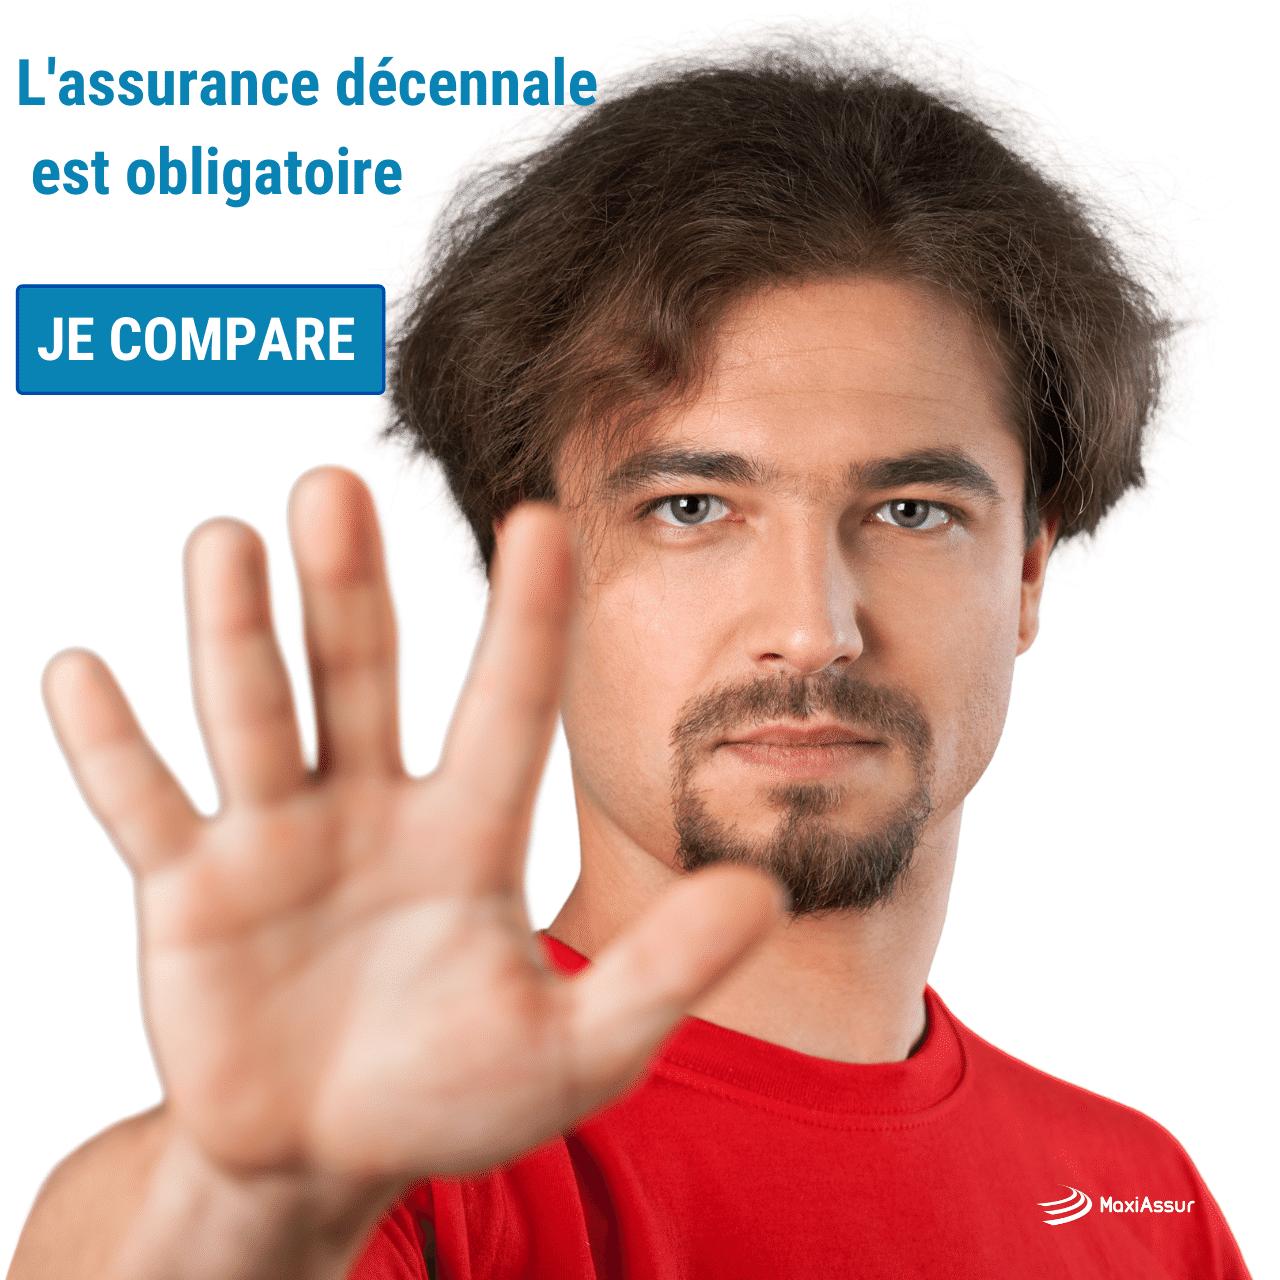 Exclure la garantie décennale _